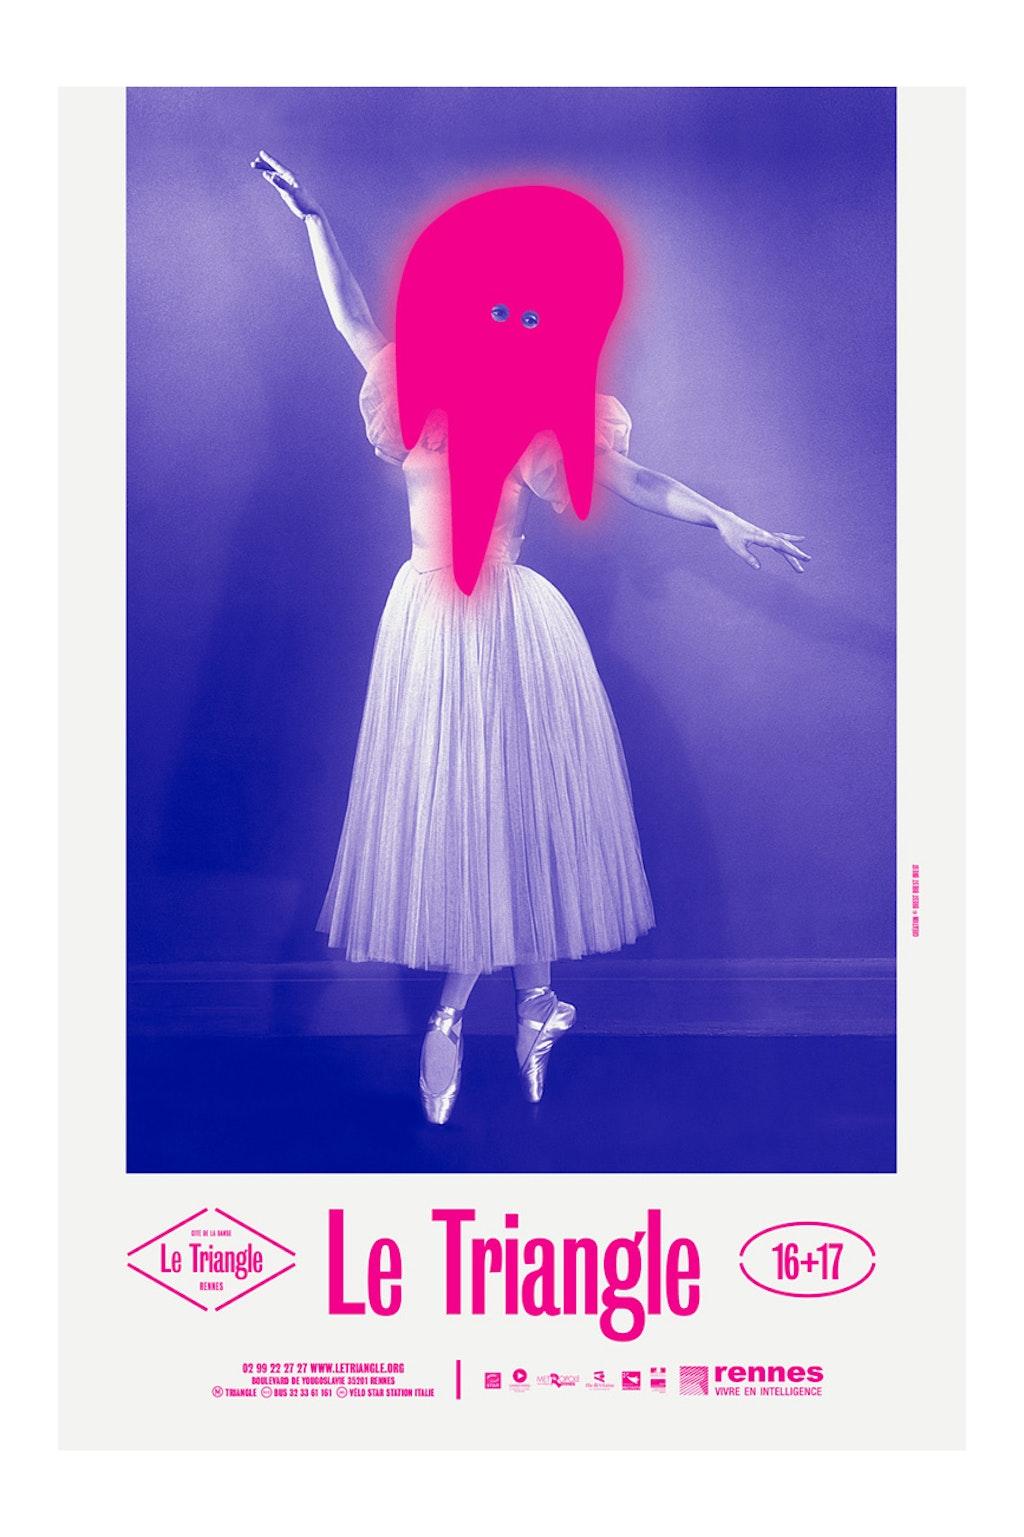 Le Triangle 16+17 (Rennes)